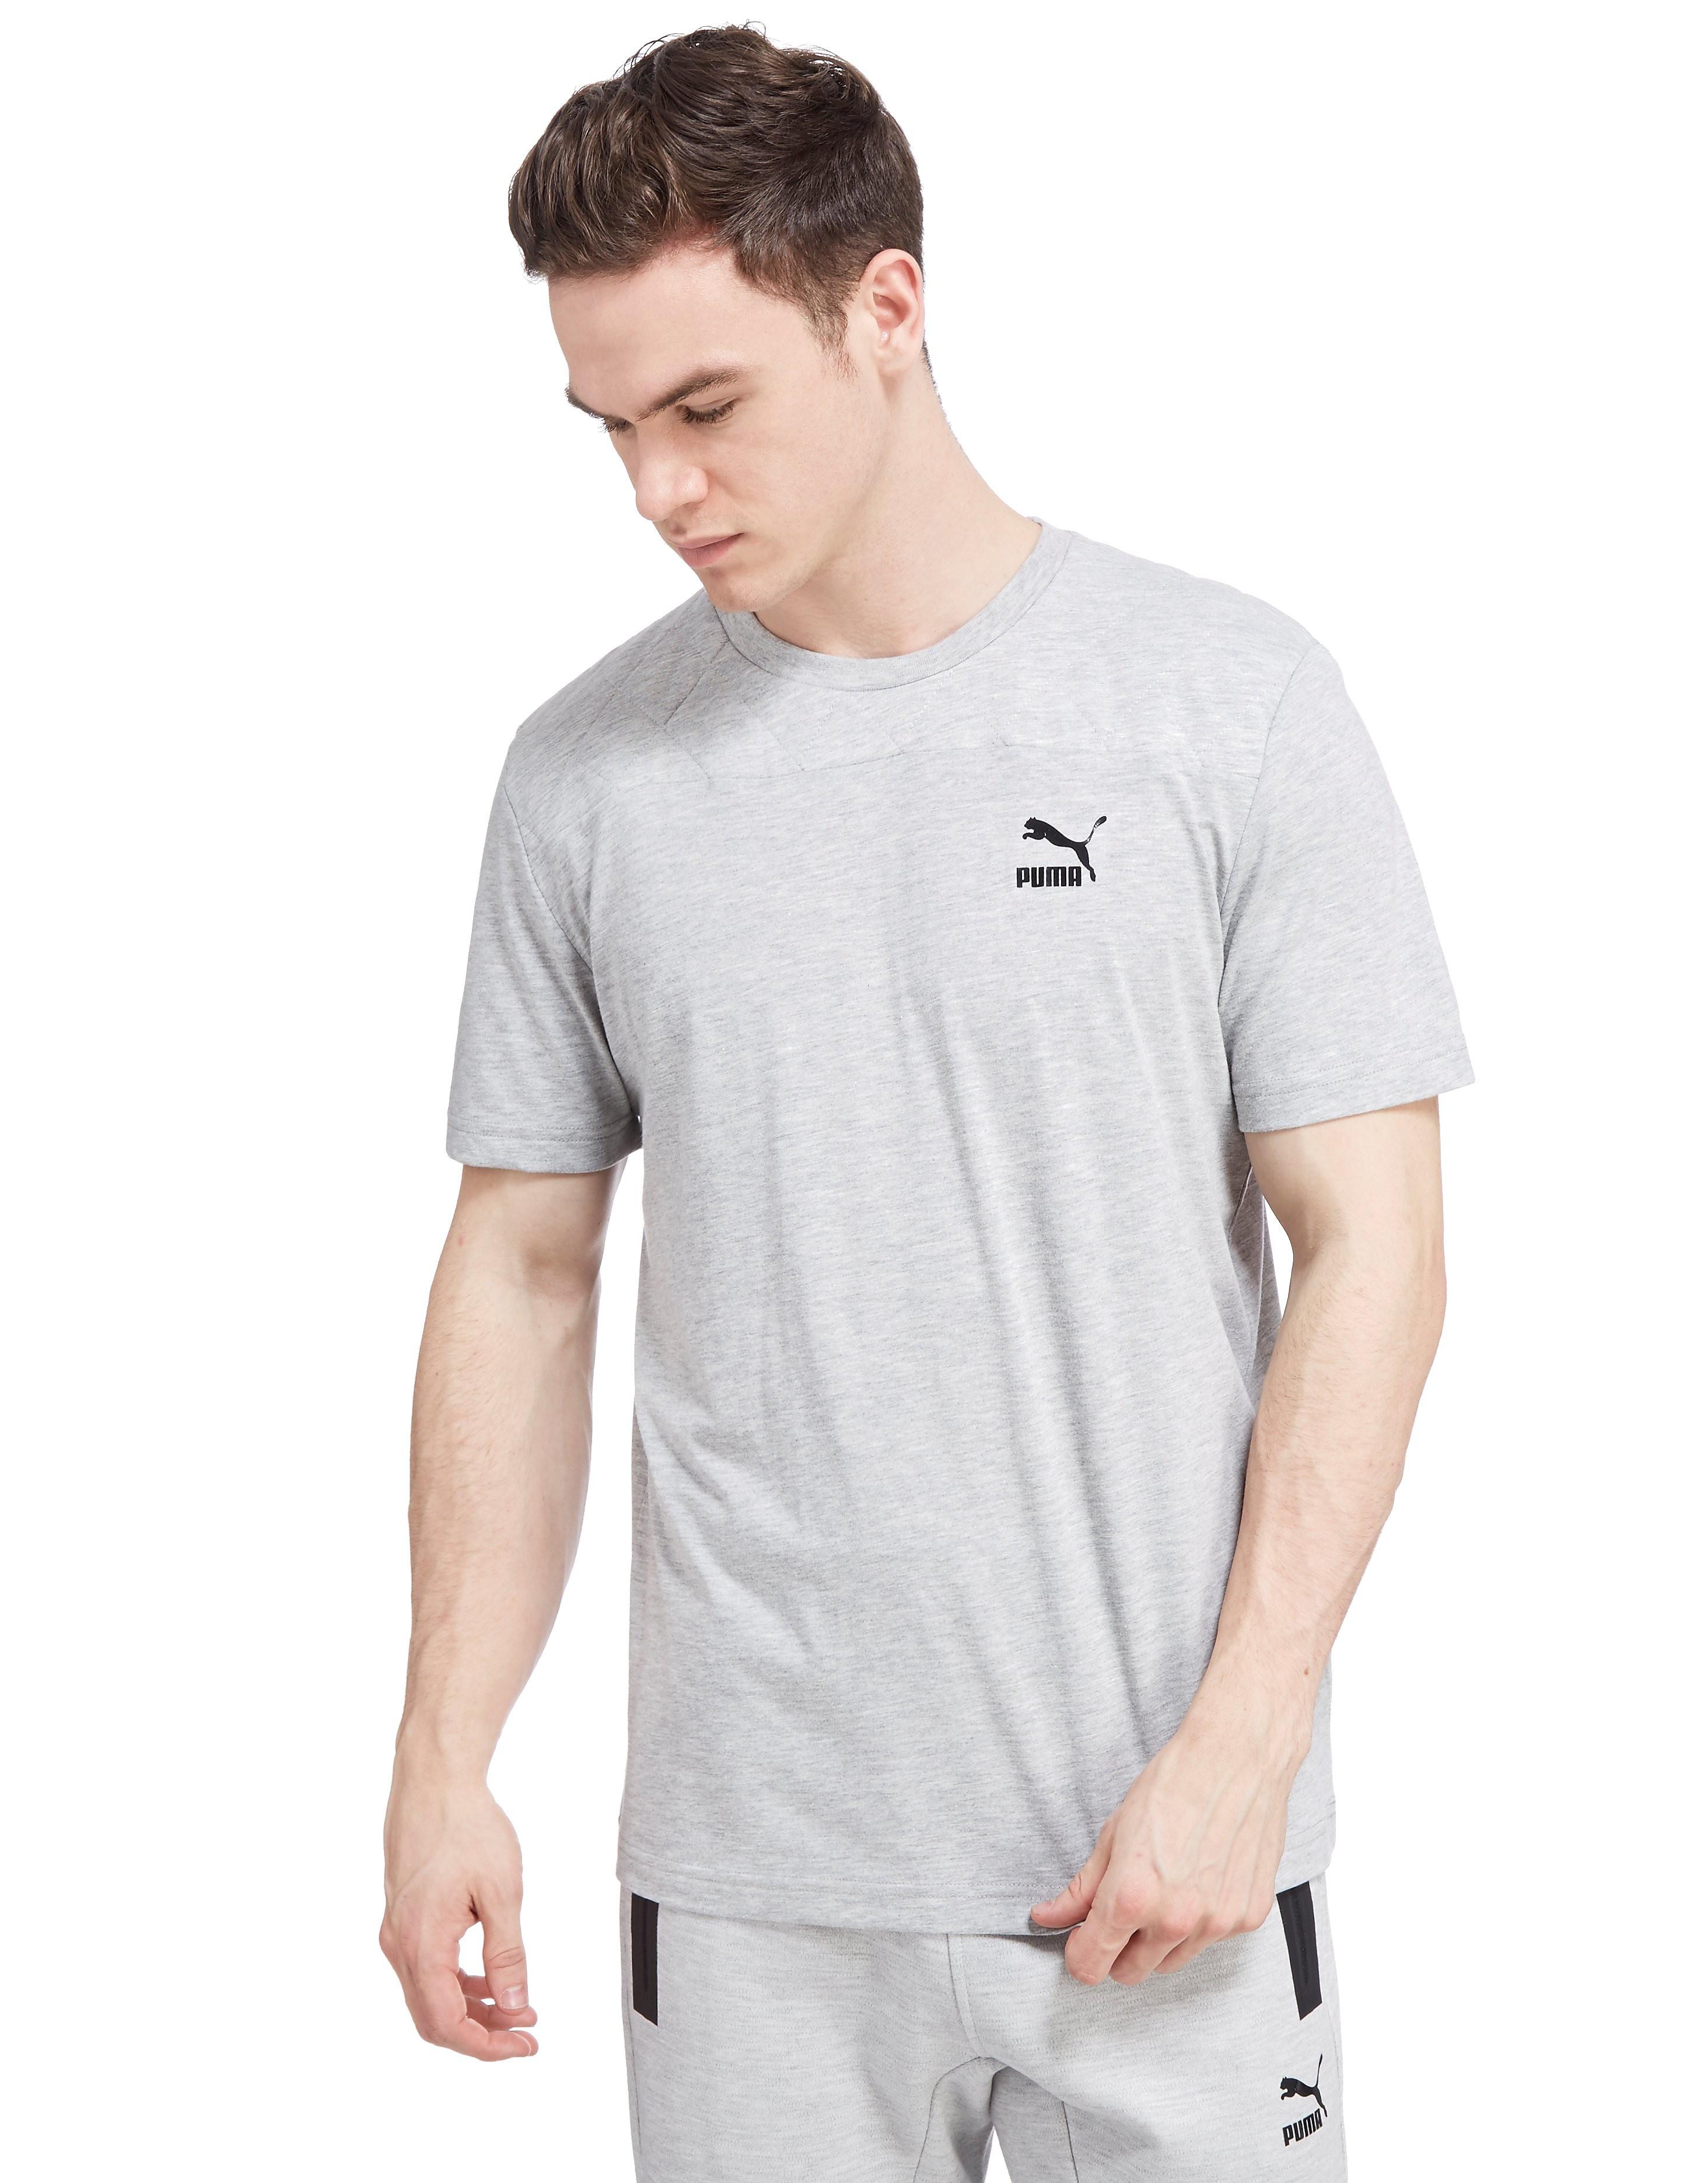 PUMA Evo Quilt T-Shirt